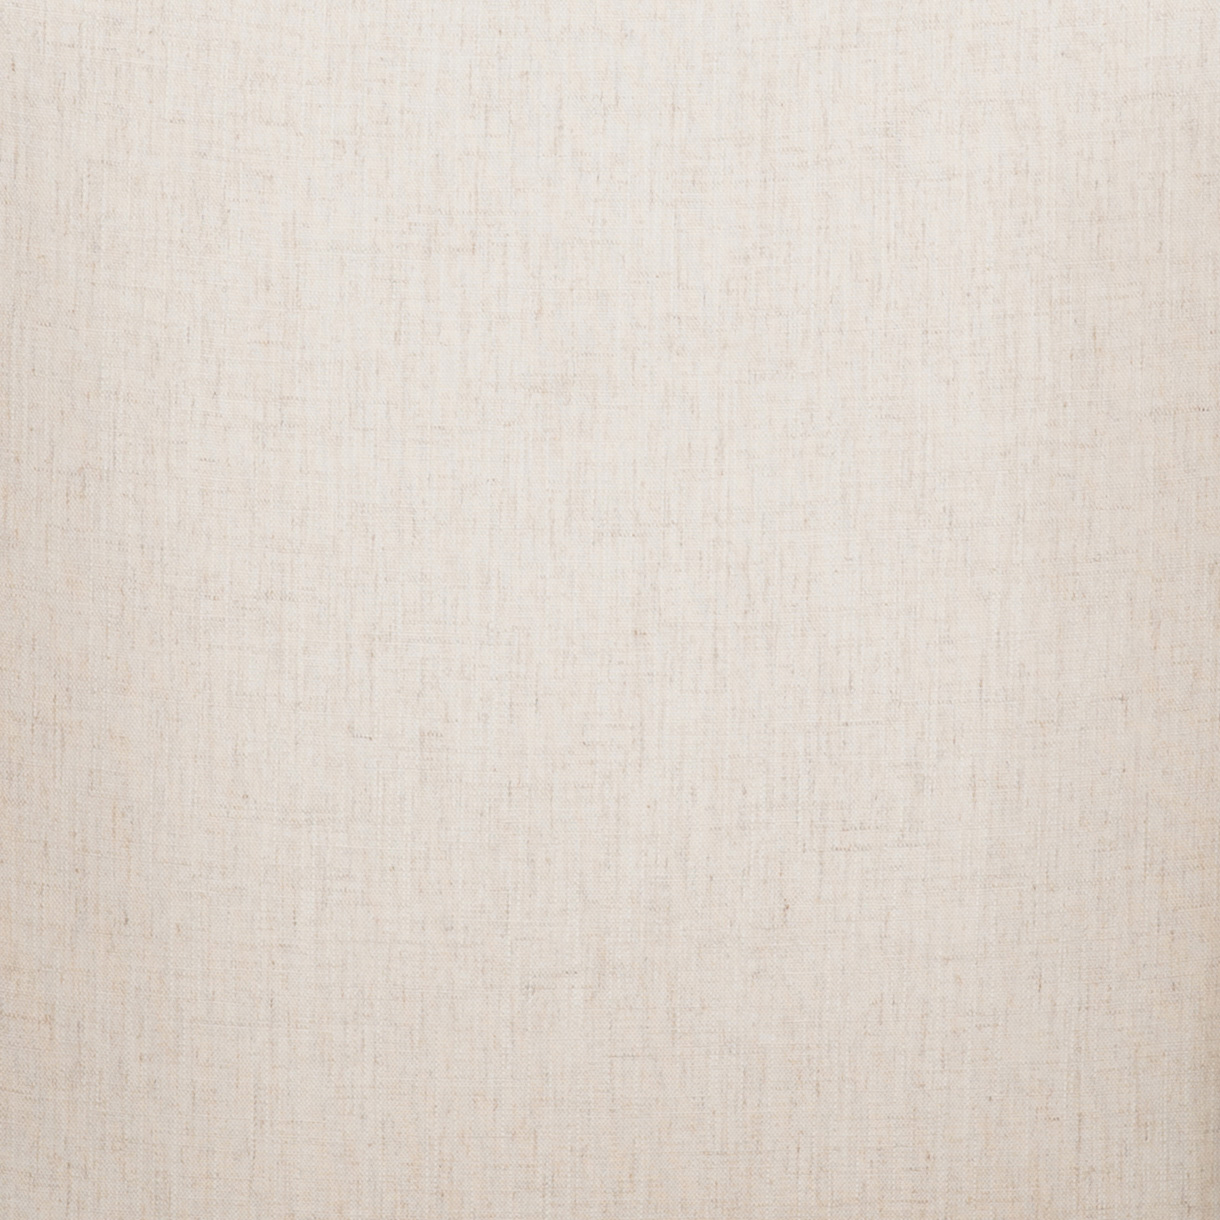 Annette Coastal Beach White Flax Upholstered Woven Natural Cane Ebony Oak Arm Chair